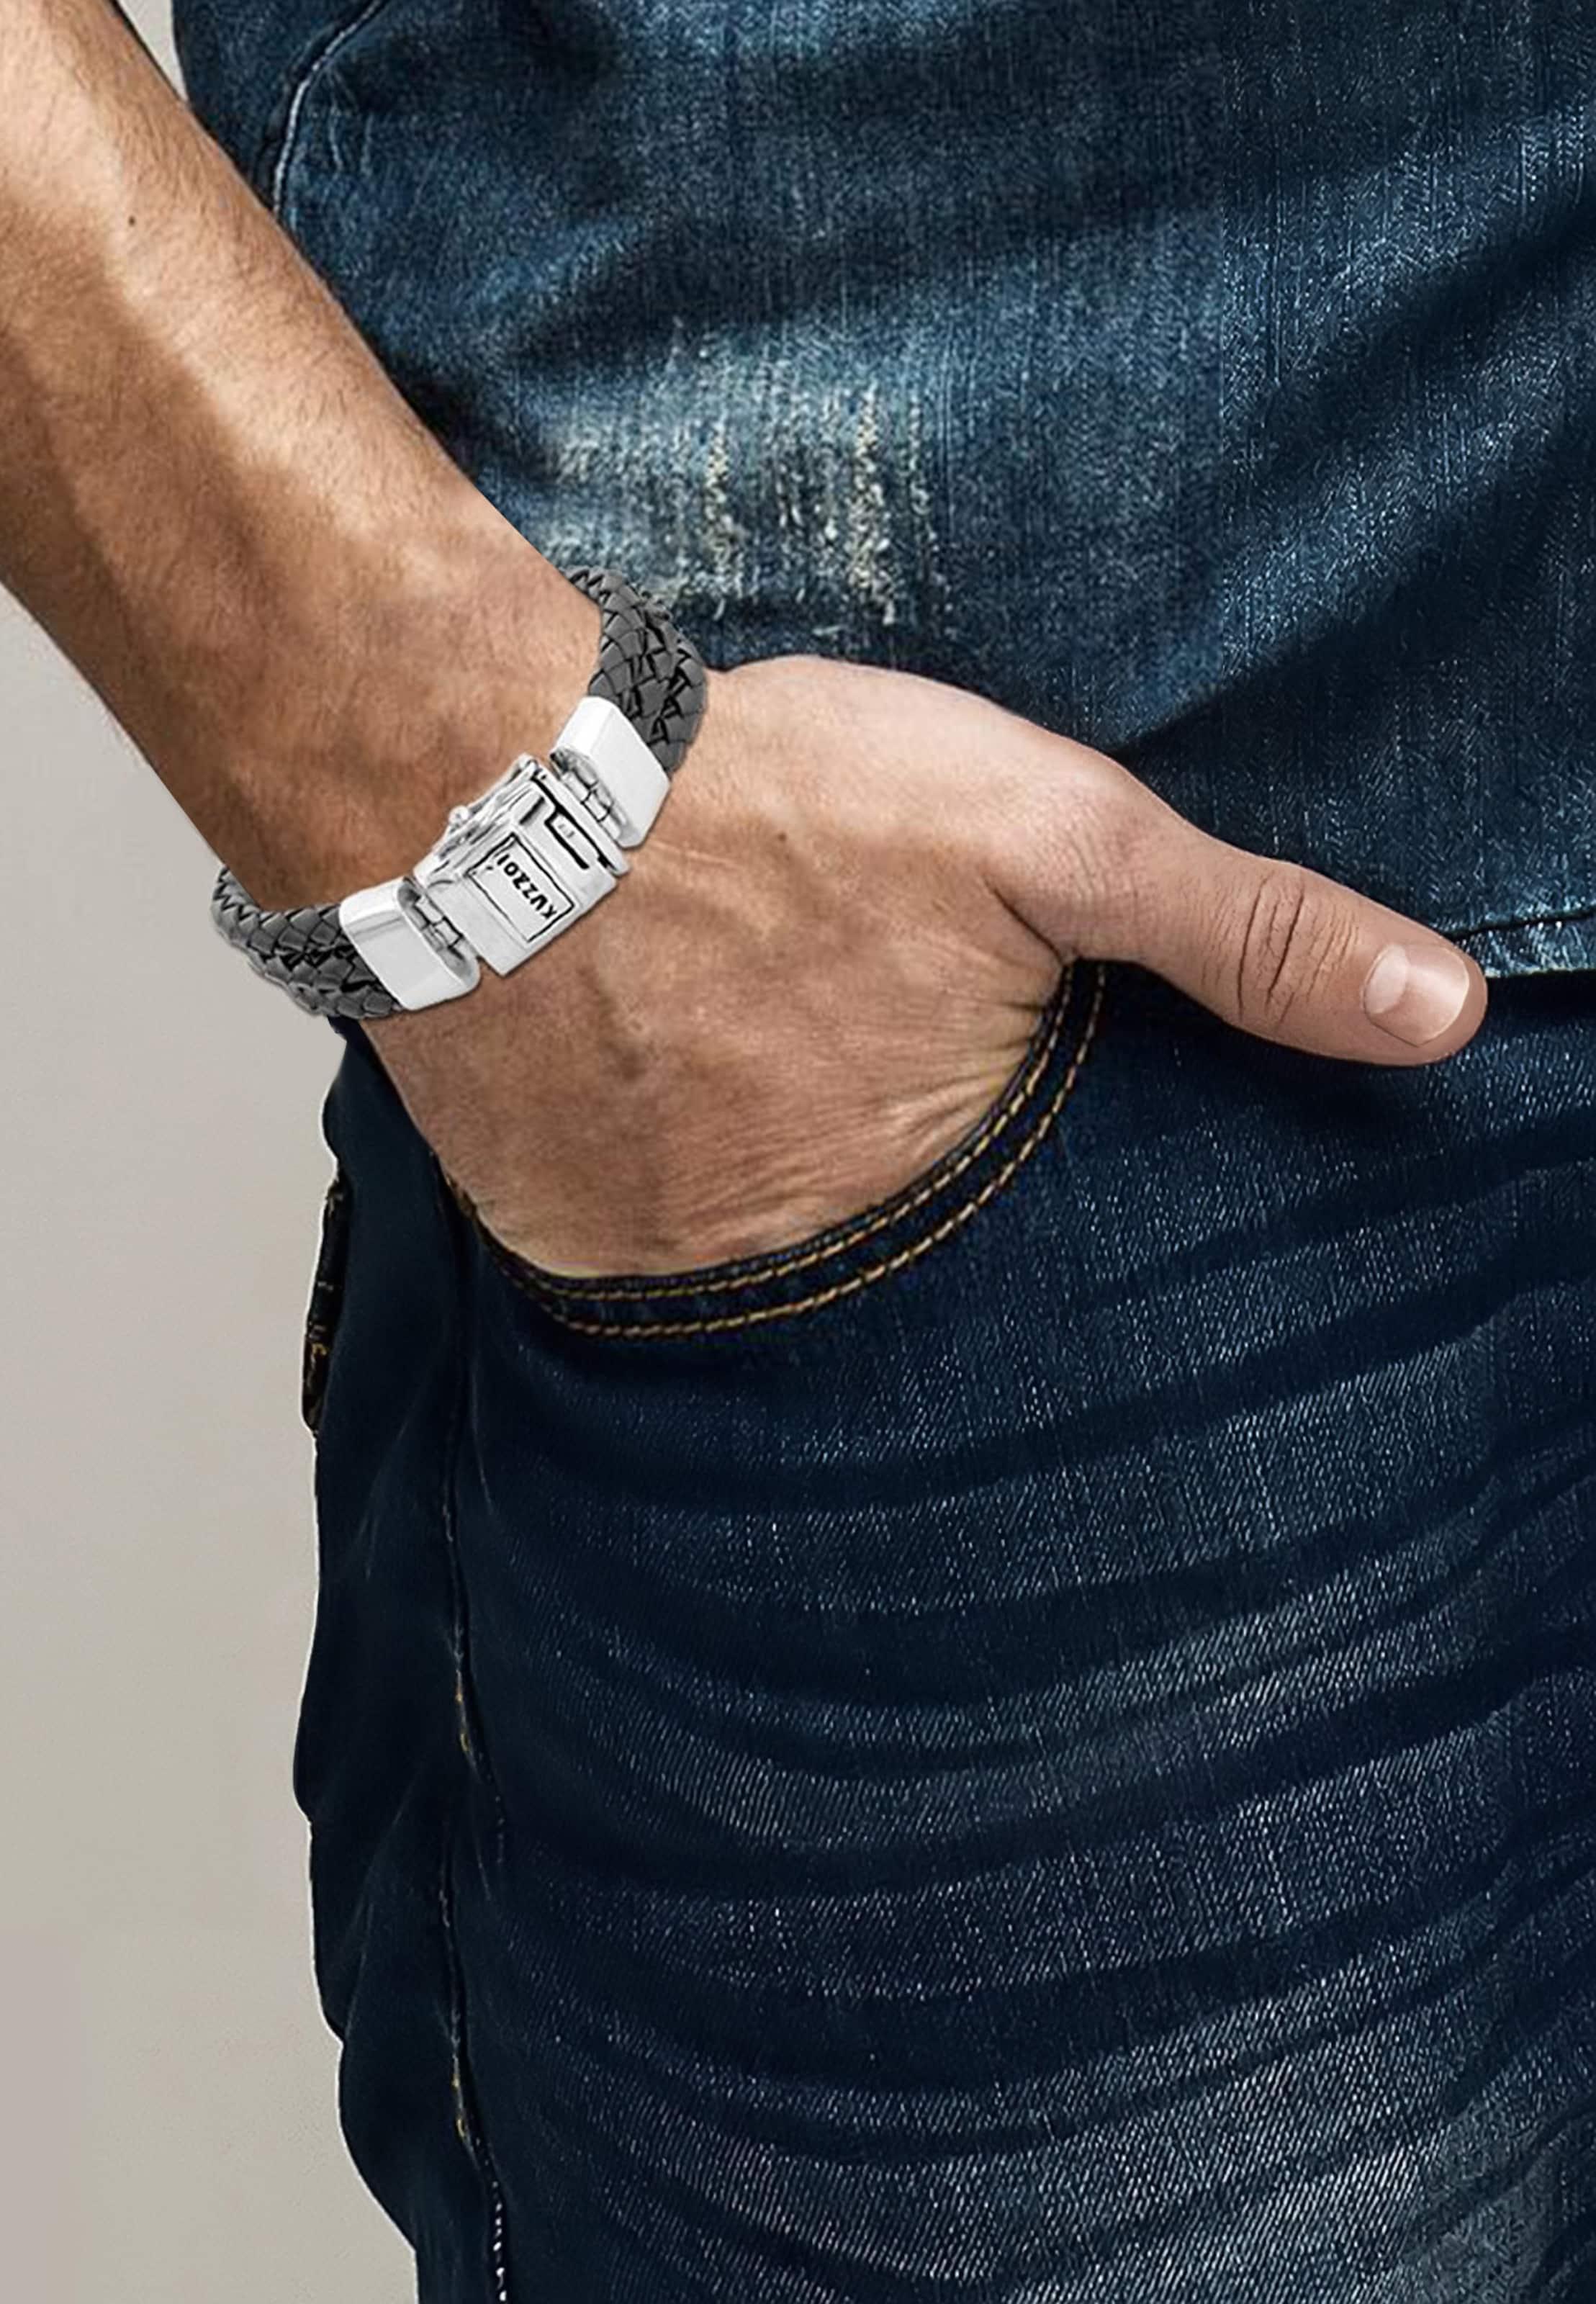 Kuzzoi In Kuzzoi Armband SchwarzSilber Armband Armband In Kuzzoi SchwarzSilber 8O0wmnvN